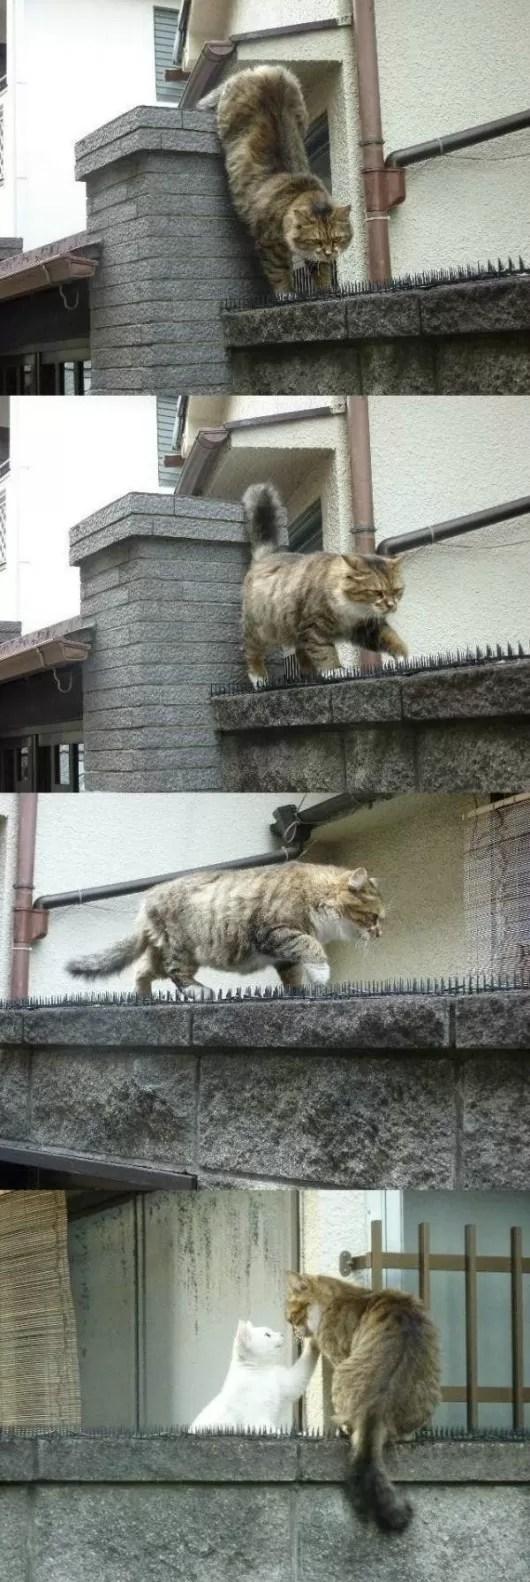 OD gatos